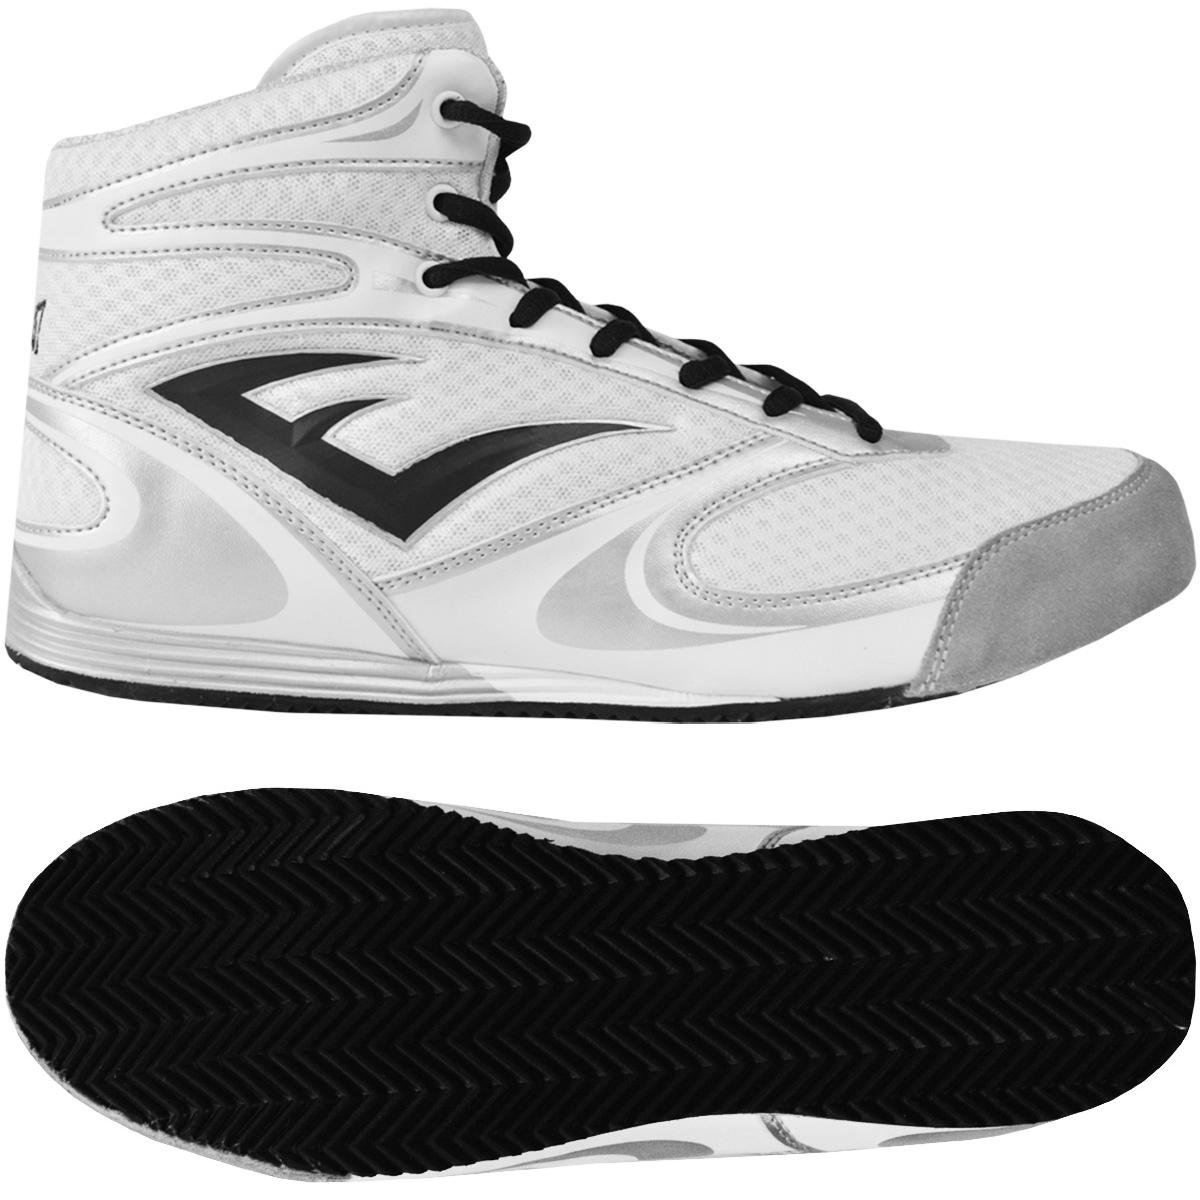 Everlast Contender Lo Top Boxing Shoe